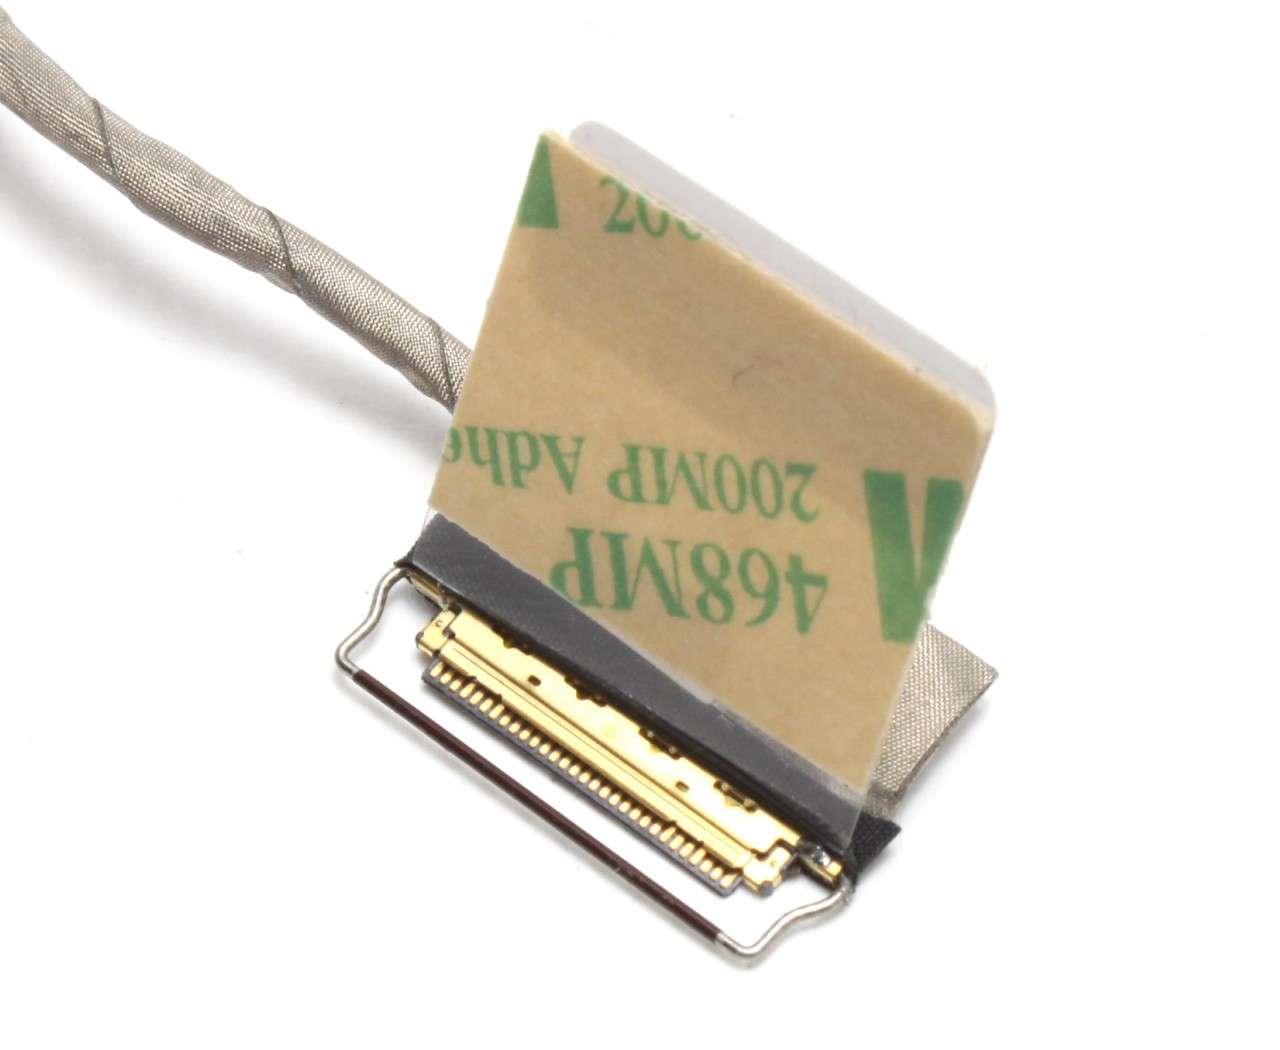 Cablu video eDP Dell 8M5Y7 imagine powerlaptop.ro 2021